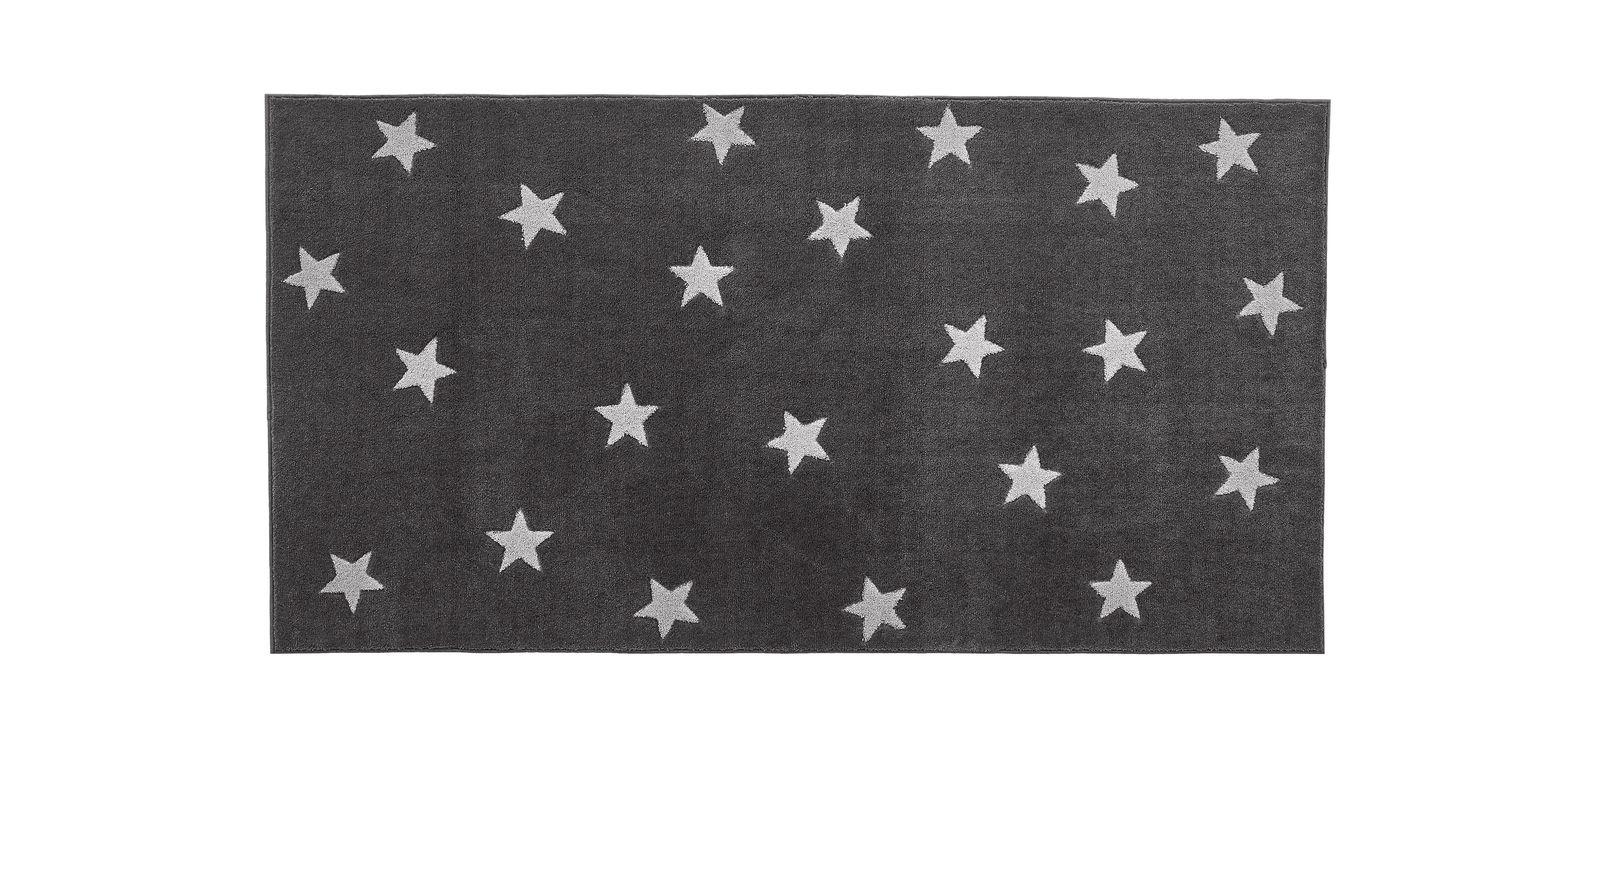 LIFEETIME Teppich Sterne in der Farbe grau